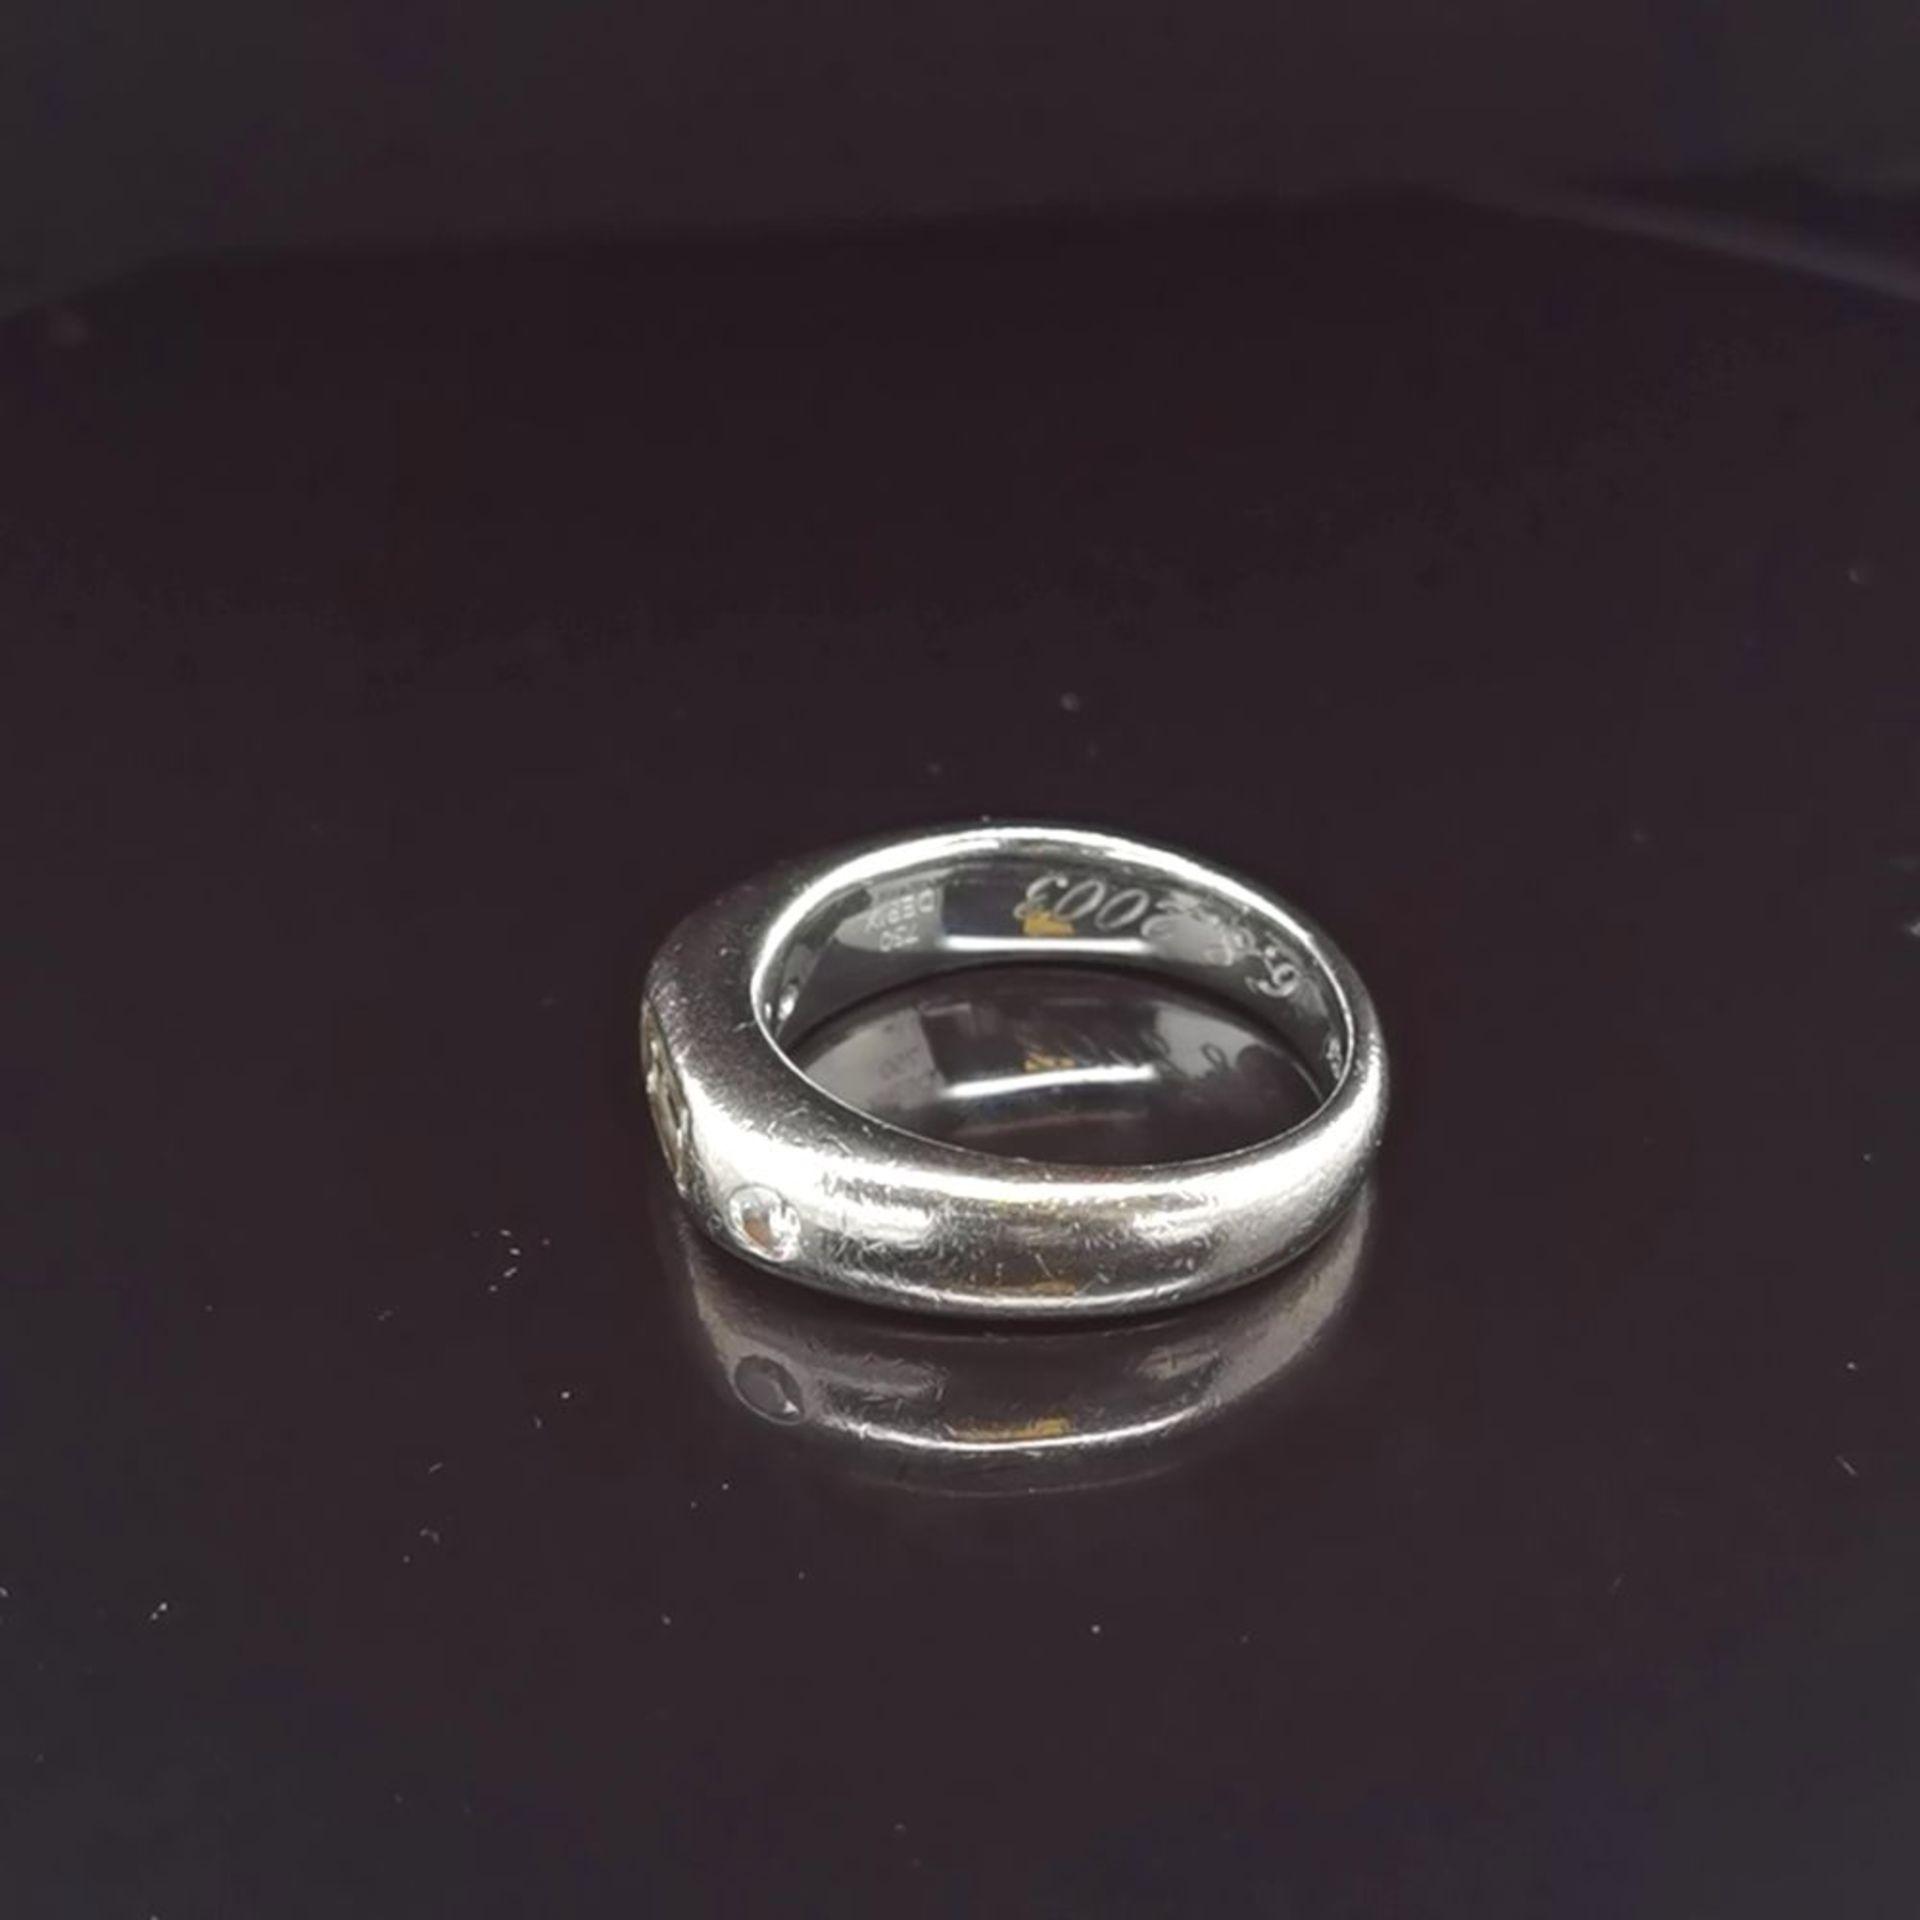 Diamant-Ring, 750 Weißgold 13,6 - Image 2 of 3